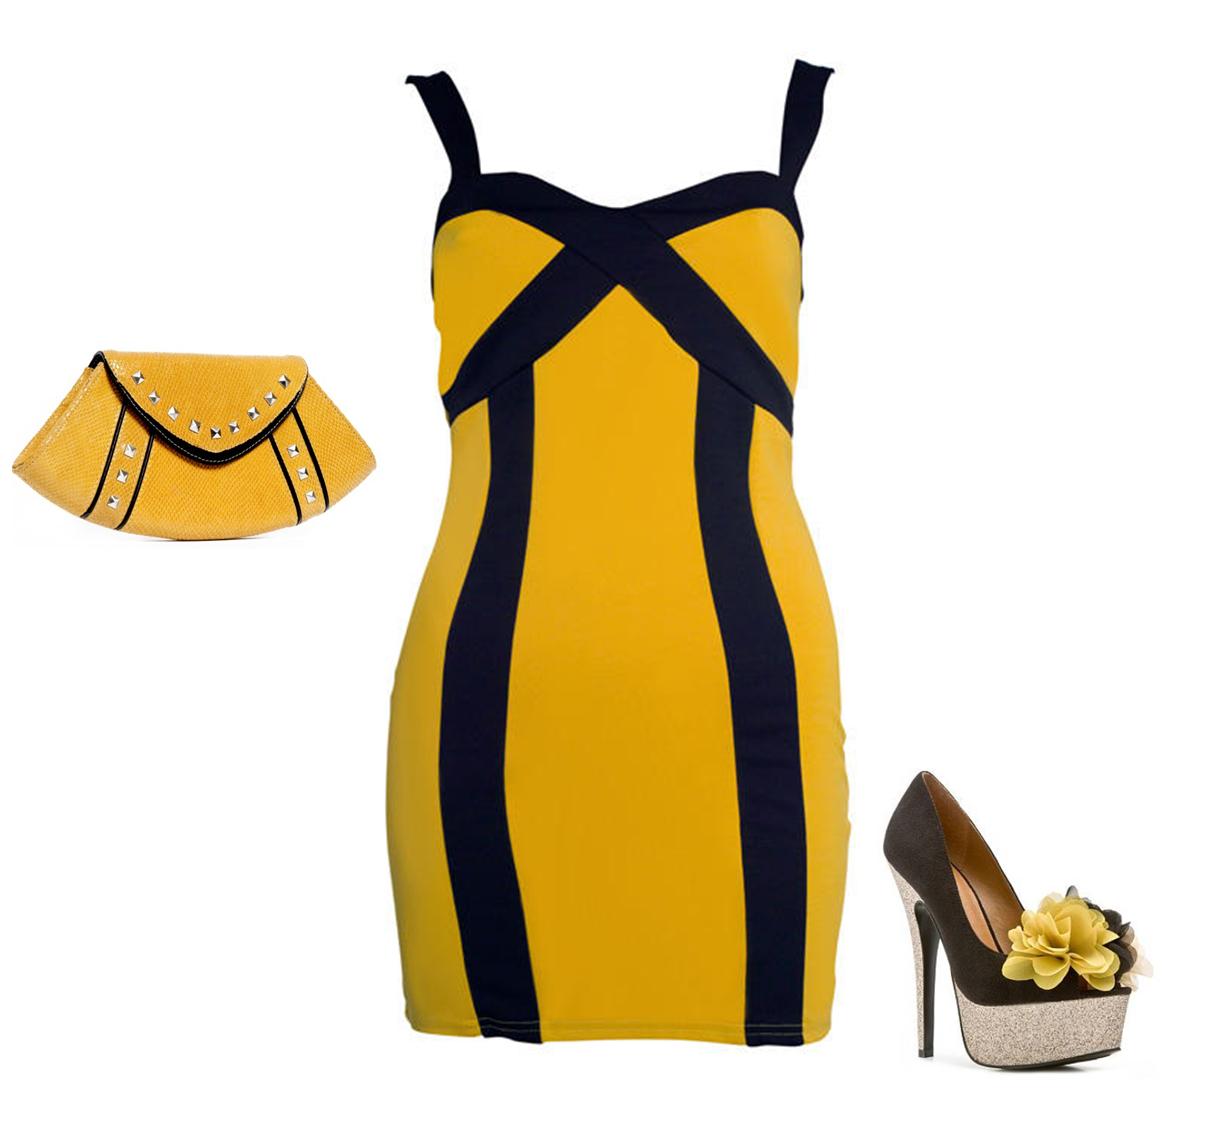 http://3.bp.blogspot.com/-6VSOp4t_I6A/UCE27Pw1rSI/AAAAAAAABSI/AOYIDpI6RLg/s1600/blck+and+mustard+dress.png